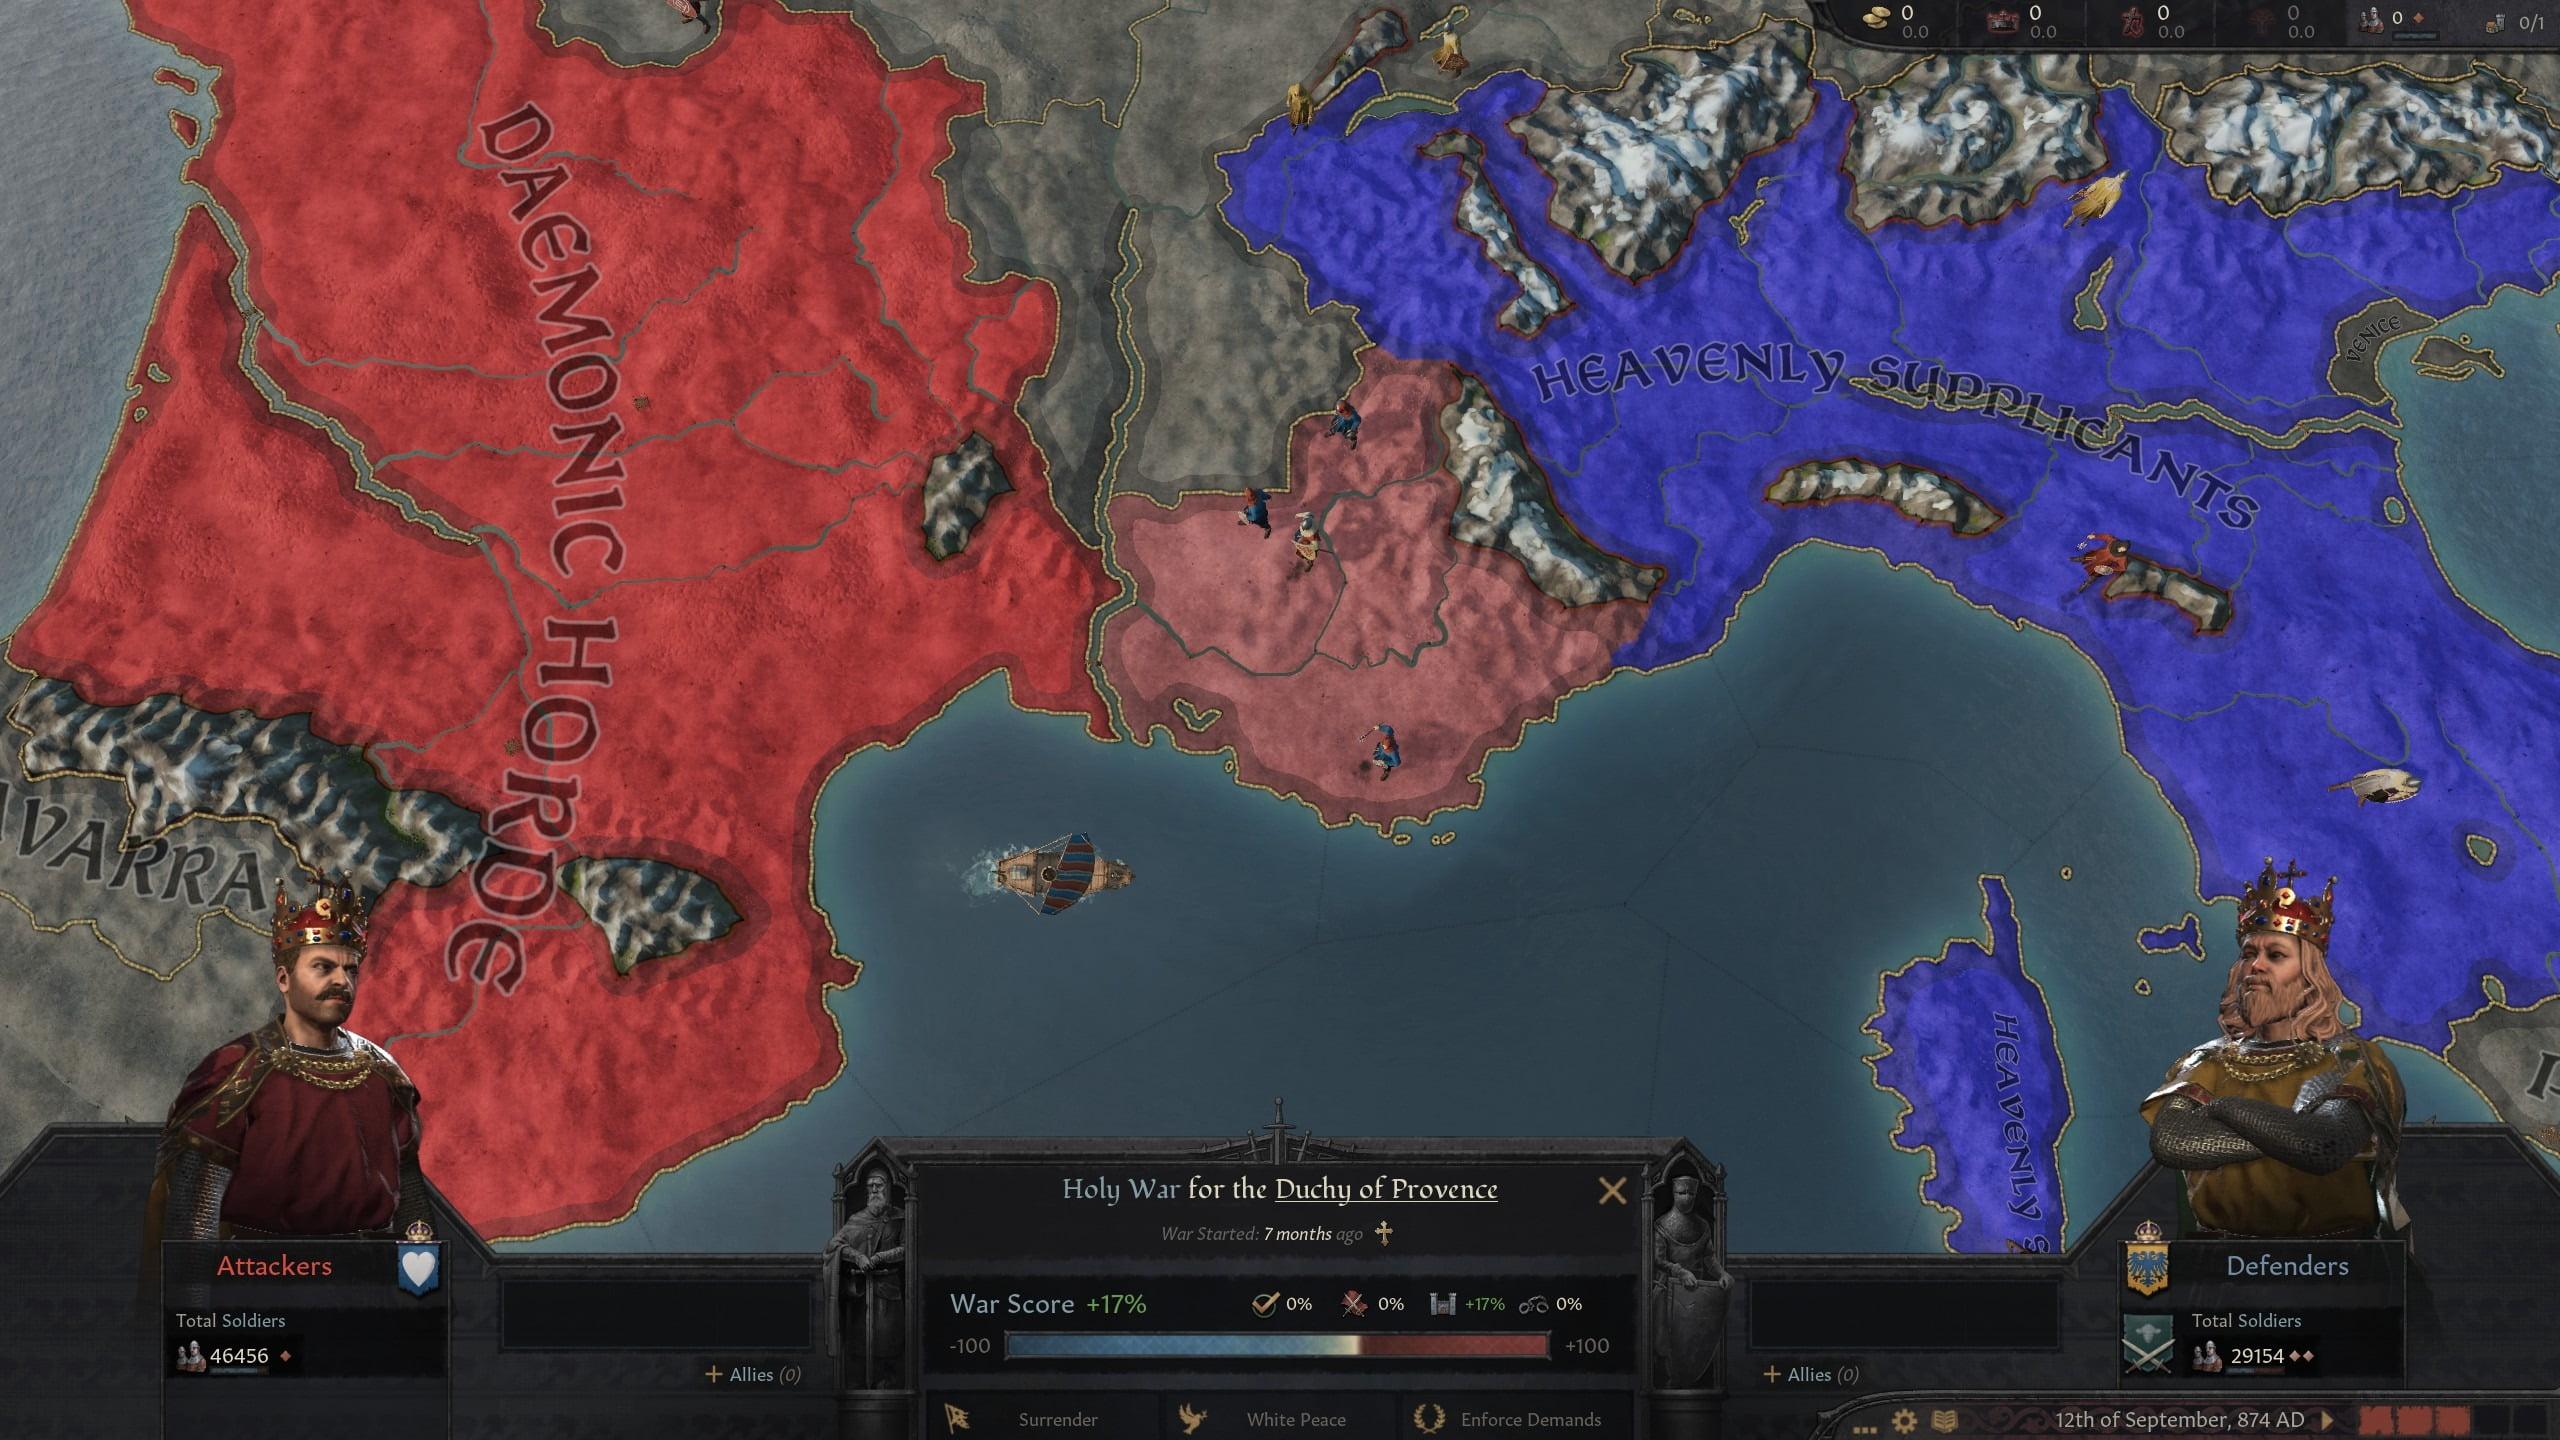 دانلود مد Pantheon of the Gods برای بازی Crusader Kings III